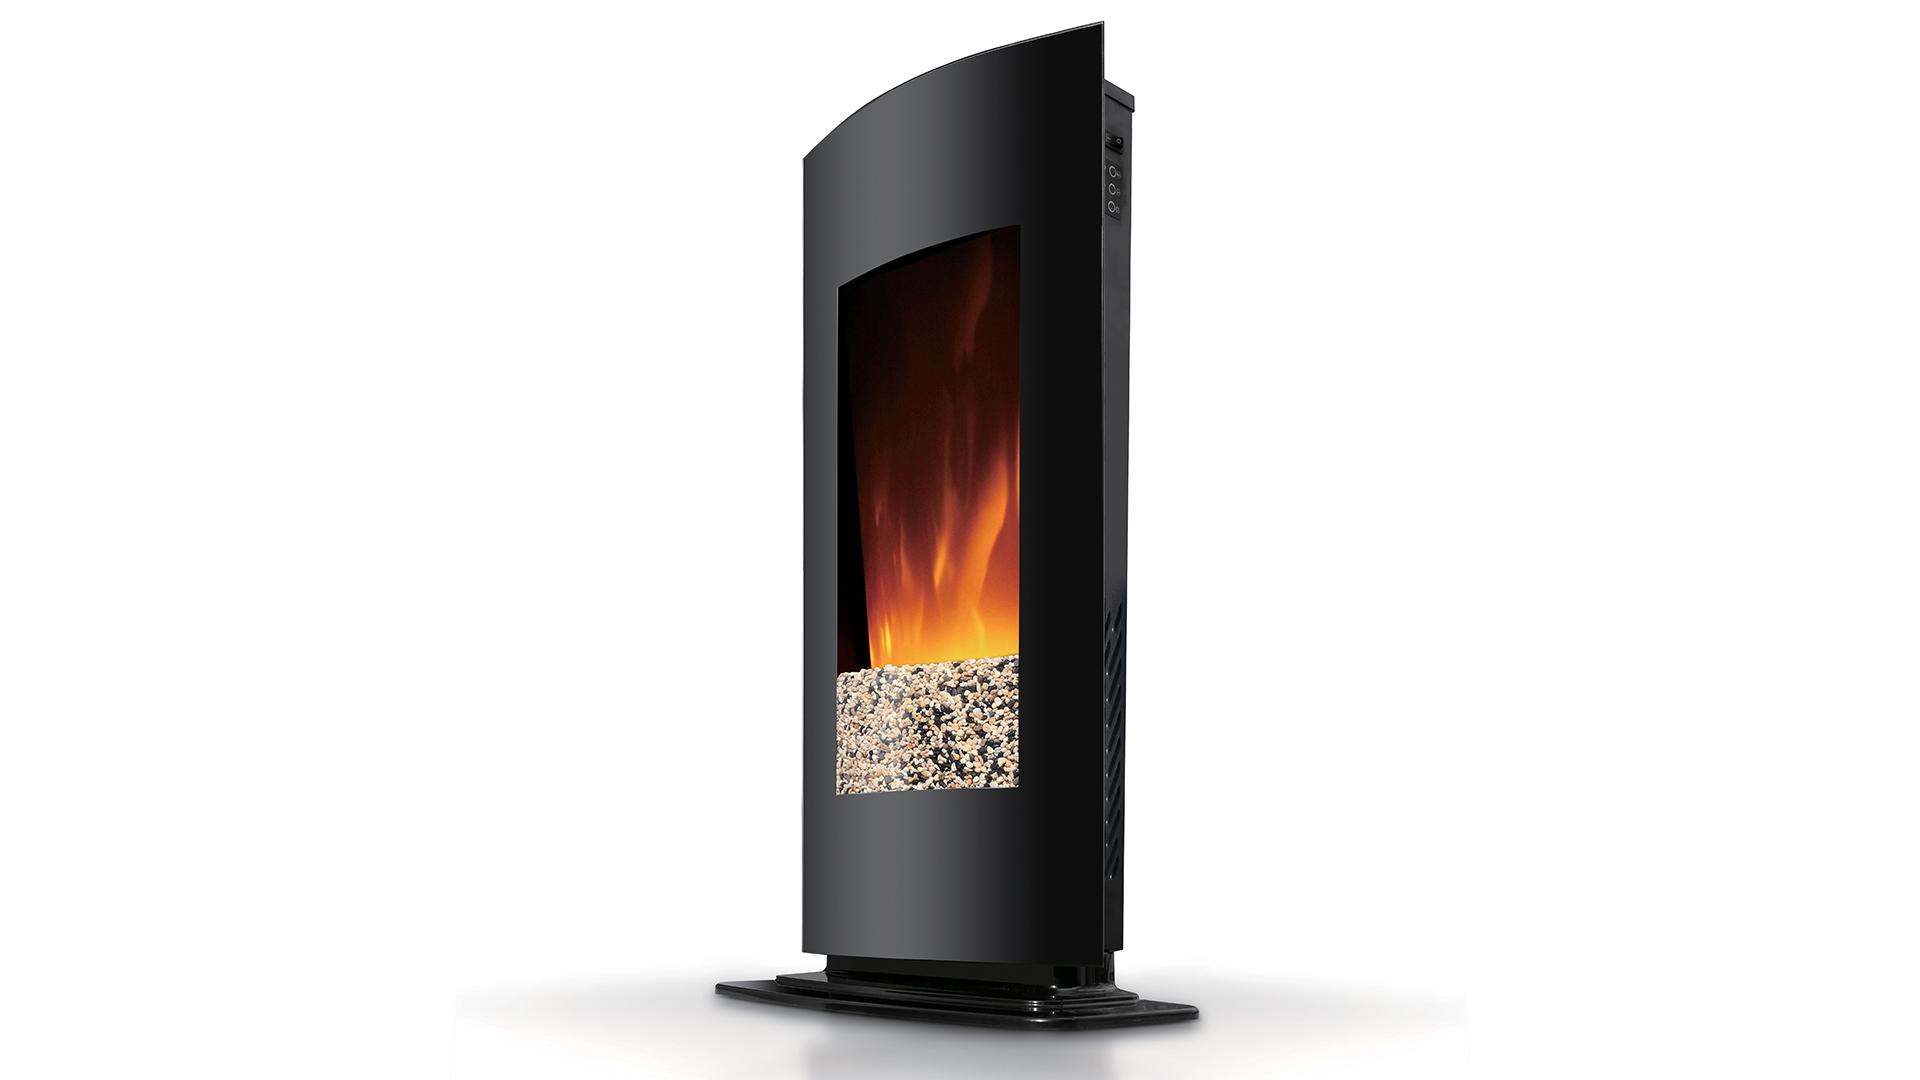 cheminee electrique verticale